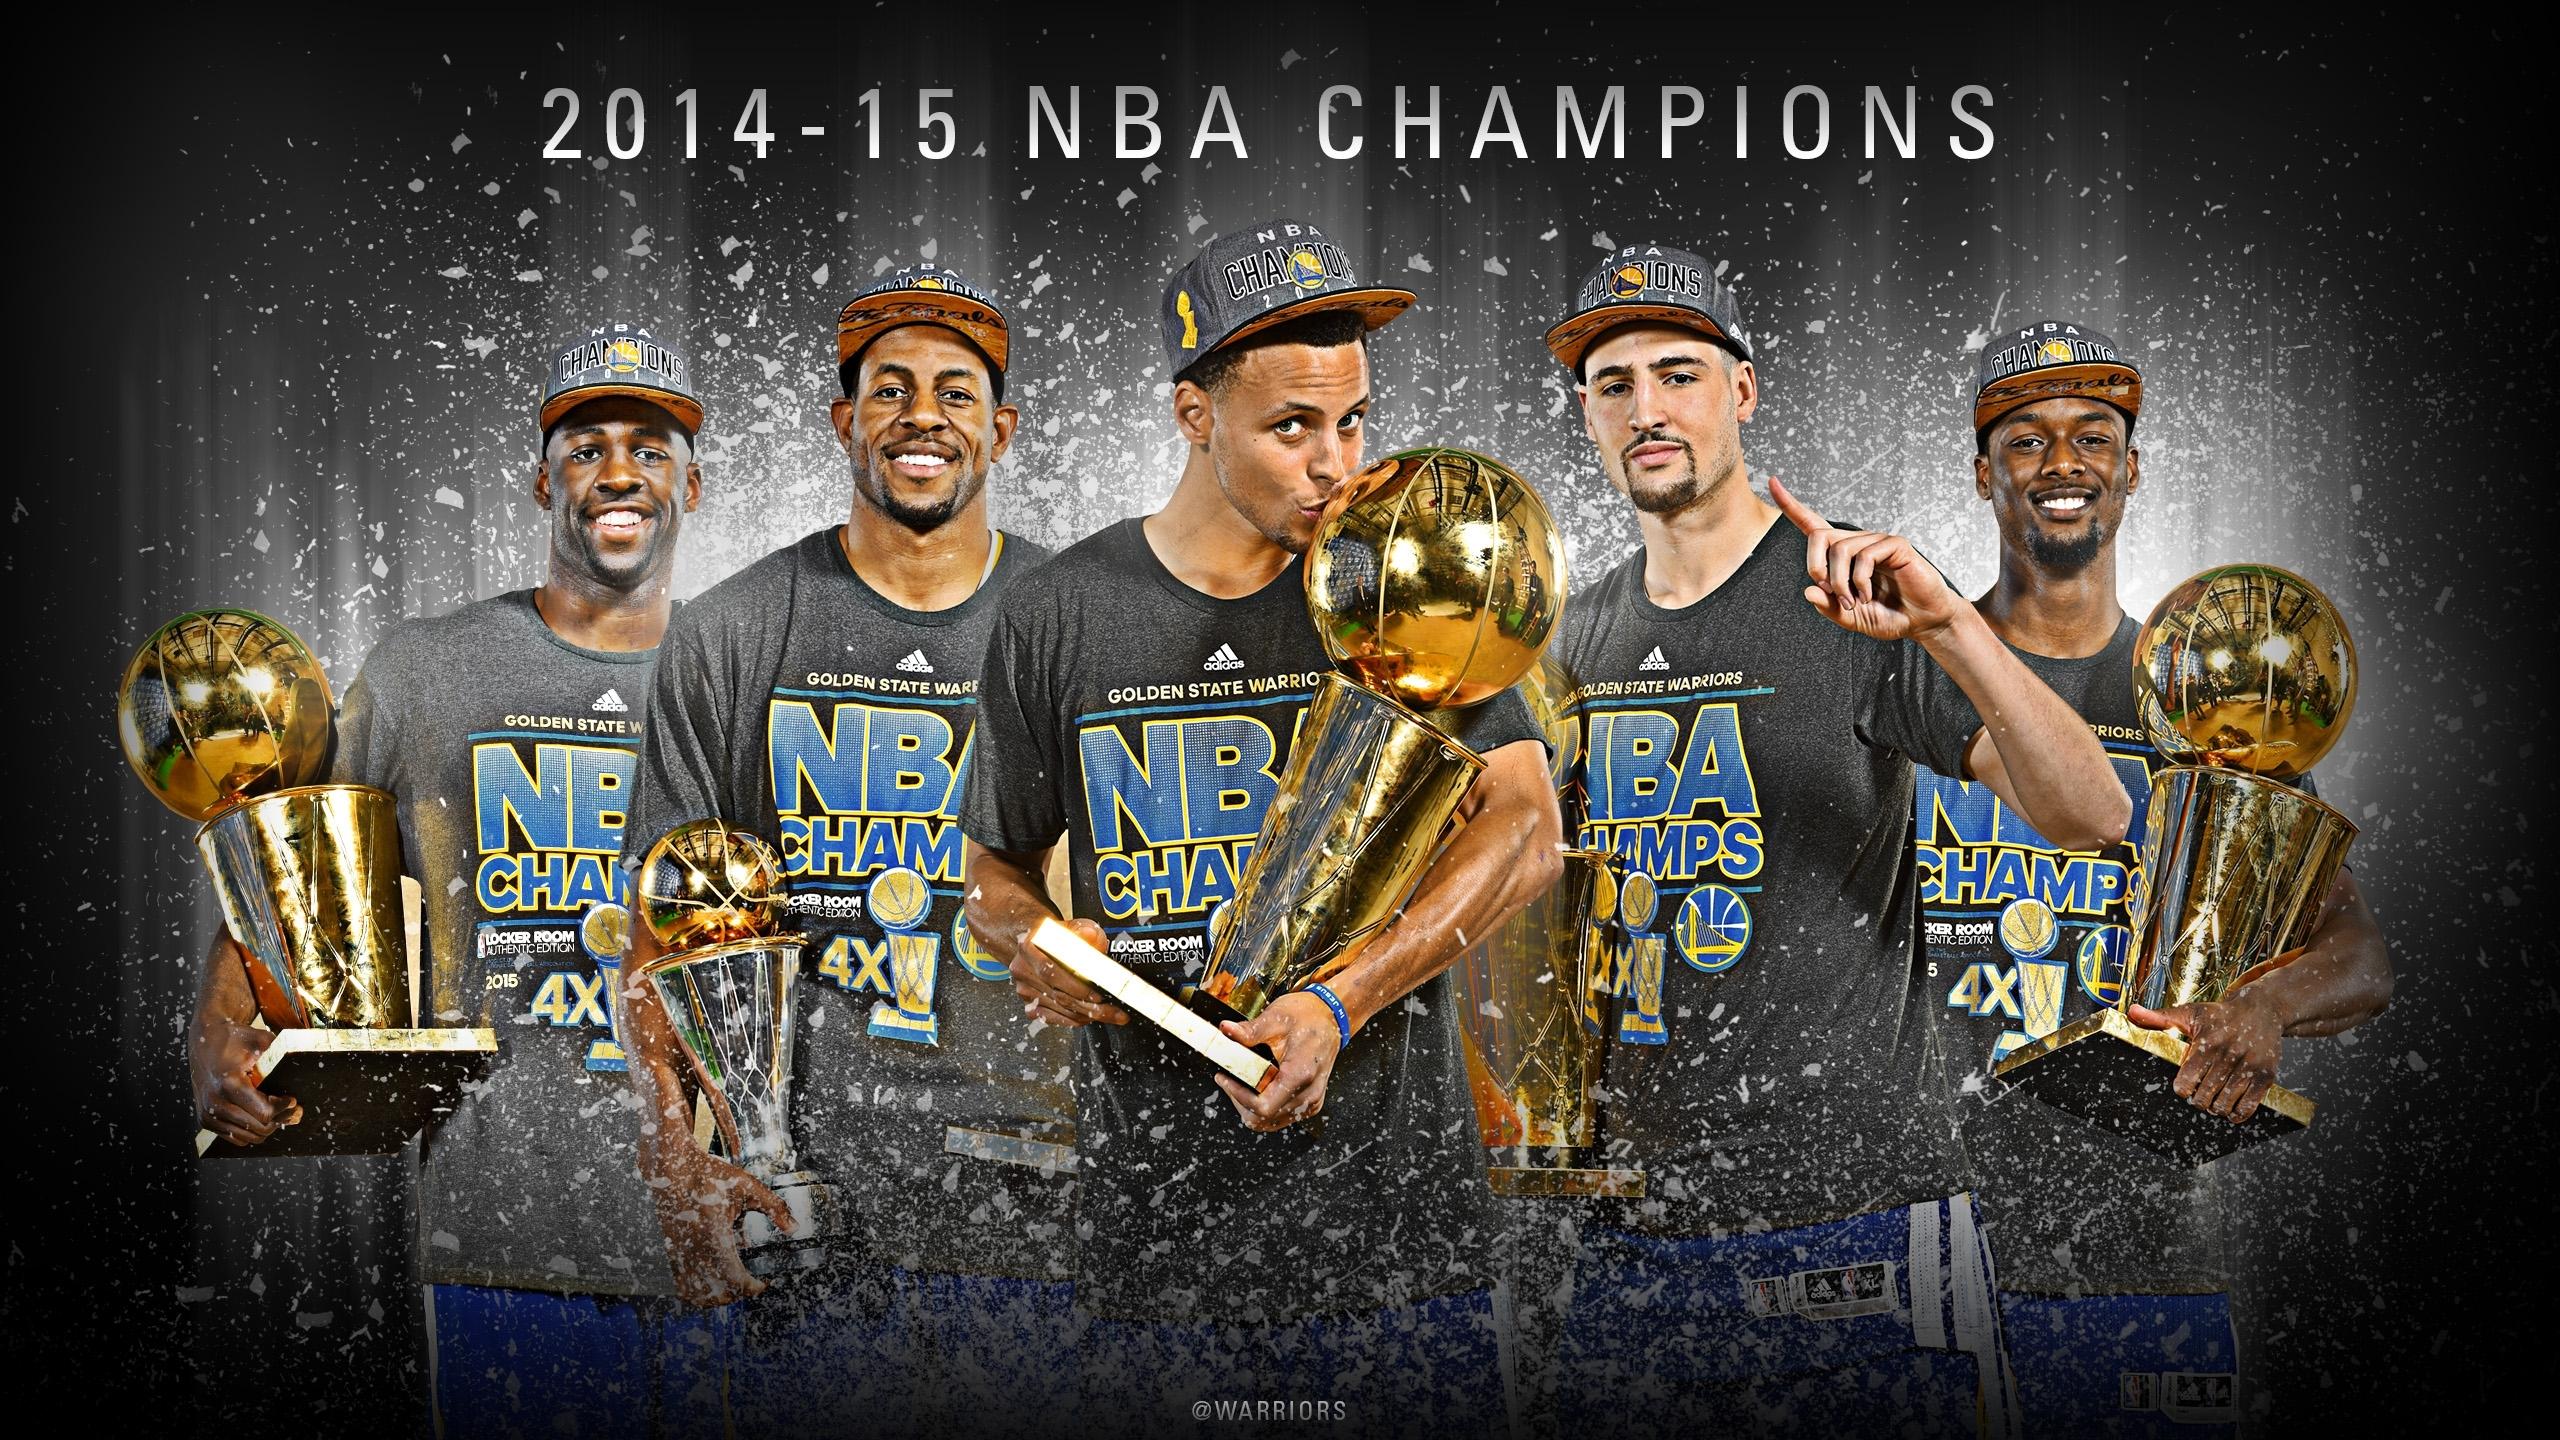 2015 nba champions | warriors artwork | pinterest | nba champions